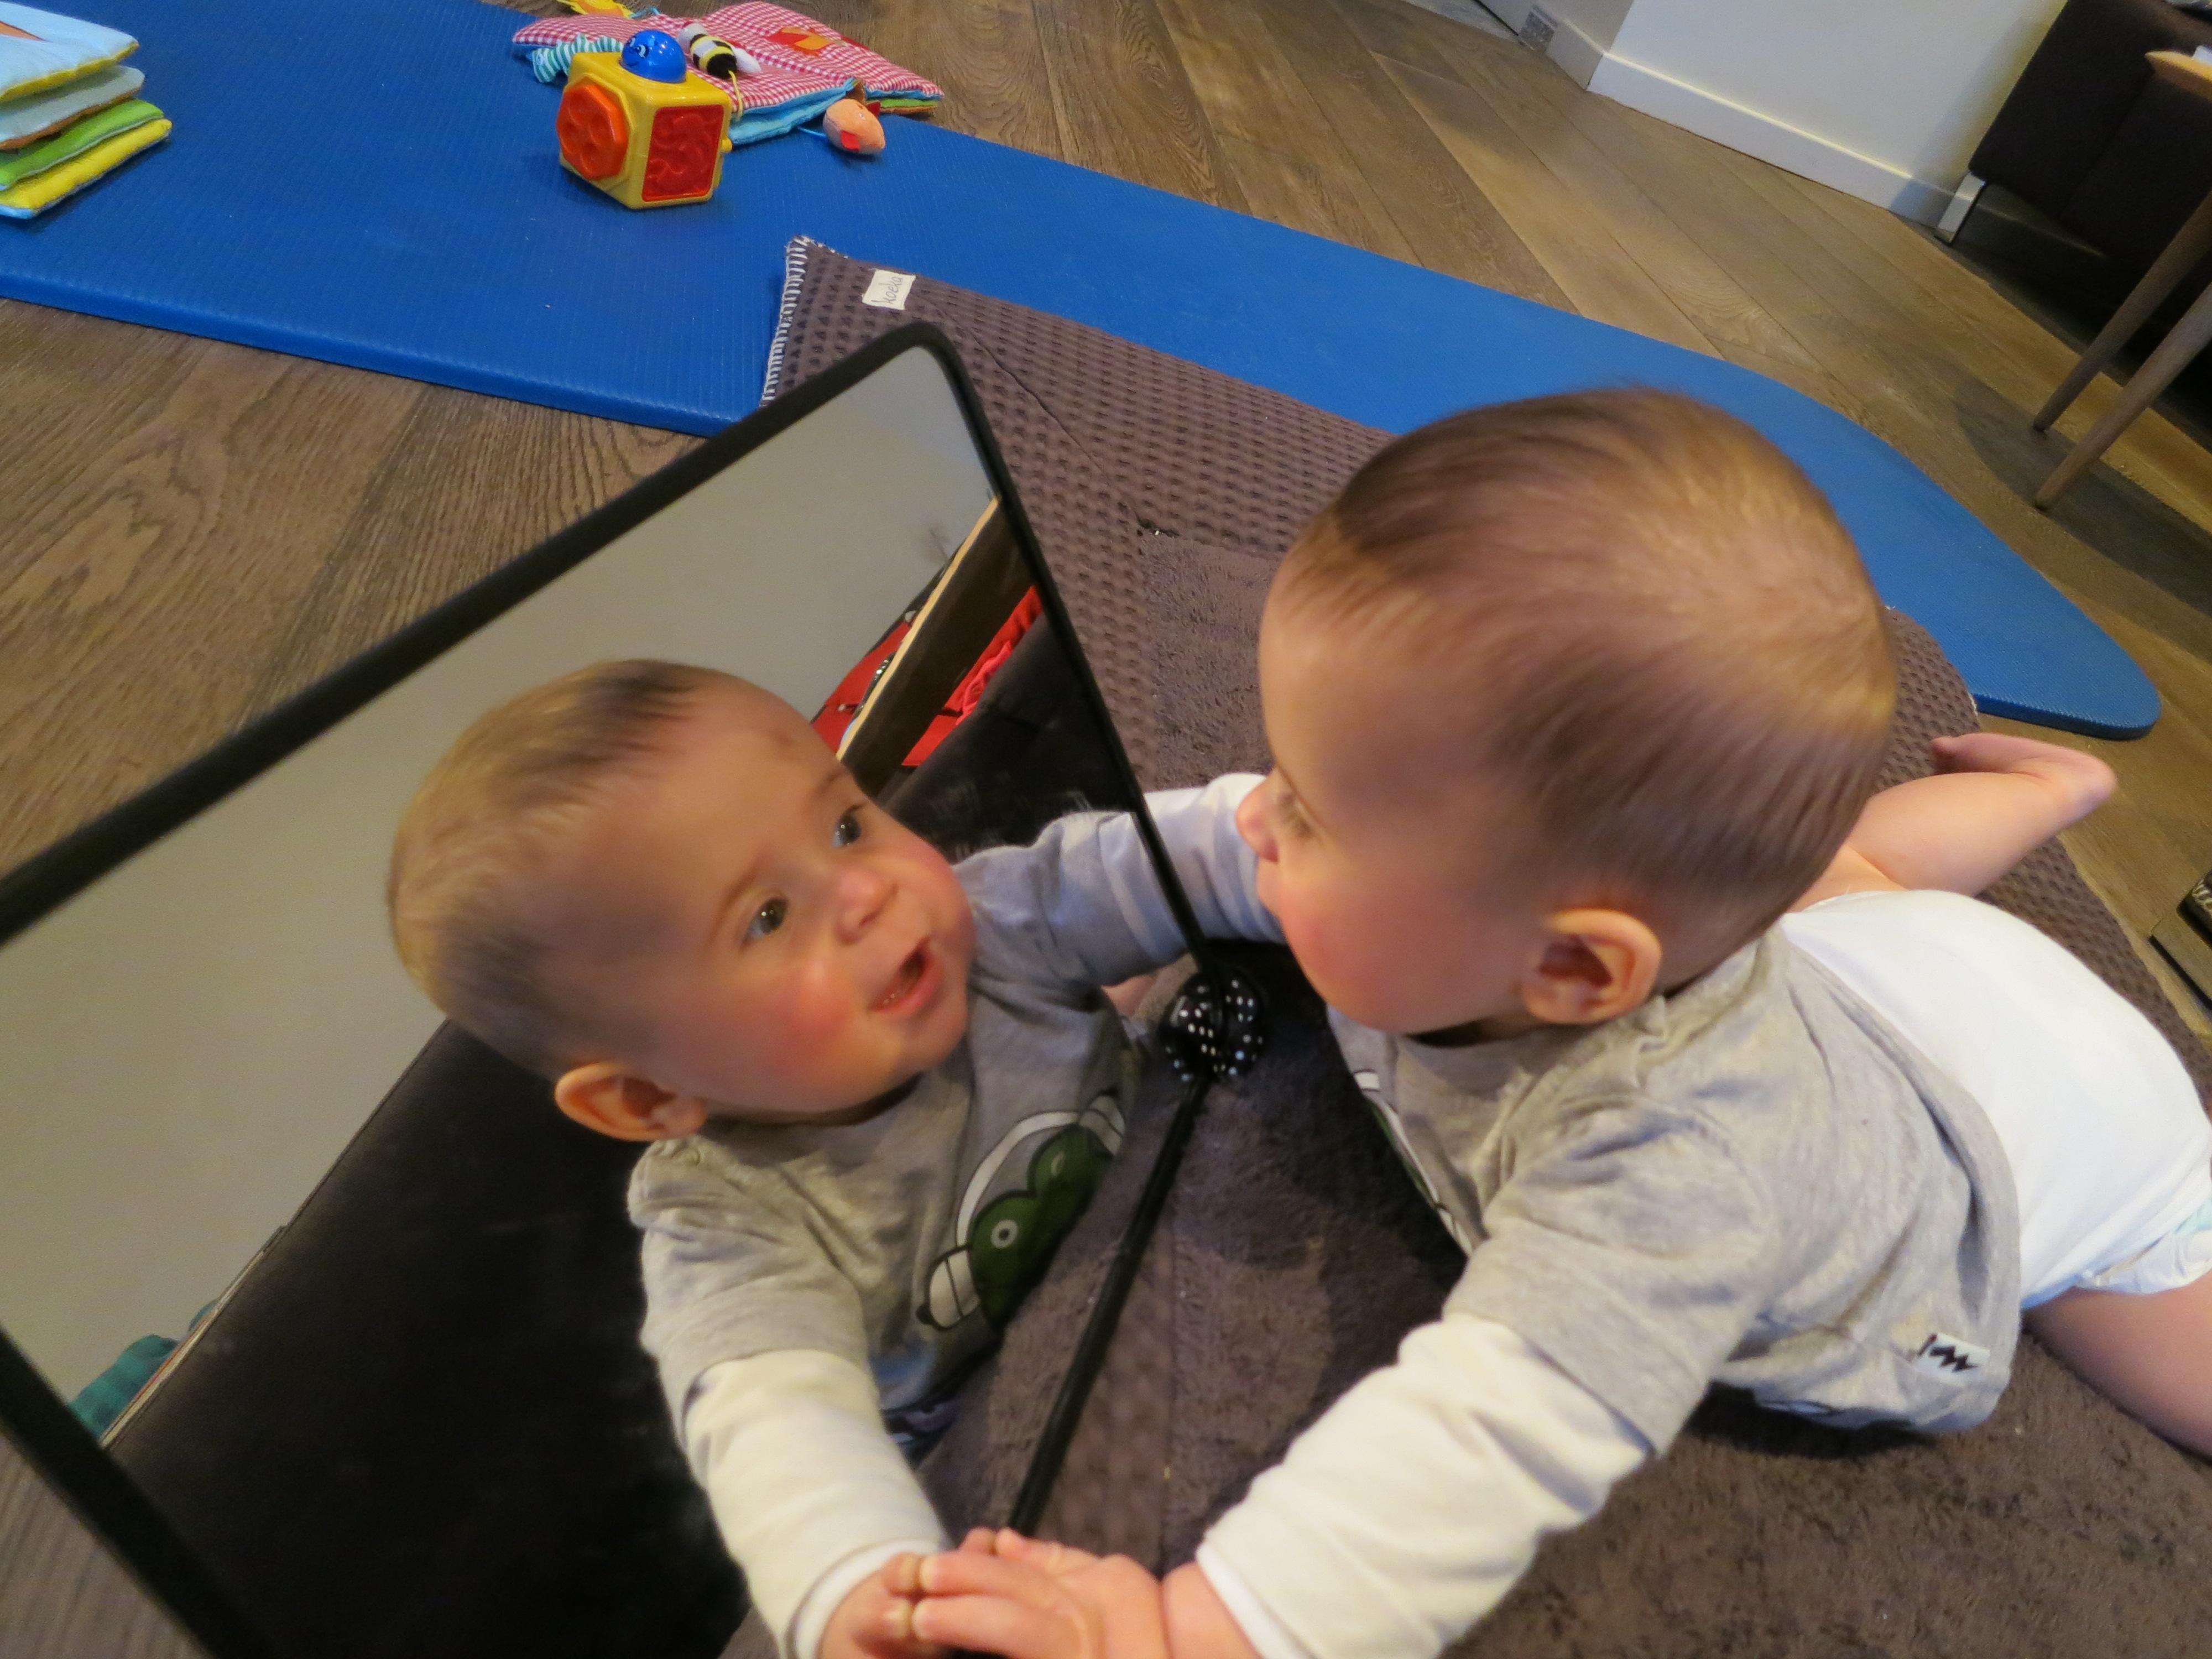 baby asymmetrie scheef plat